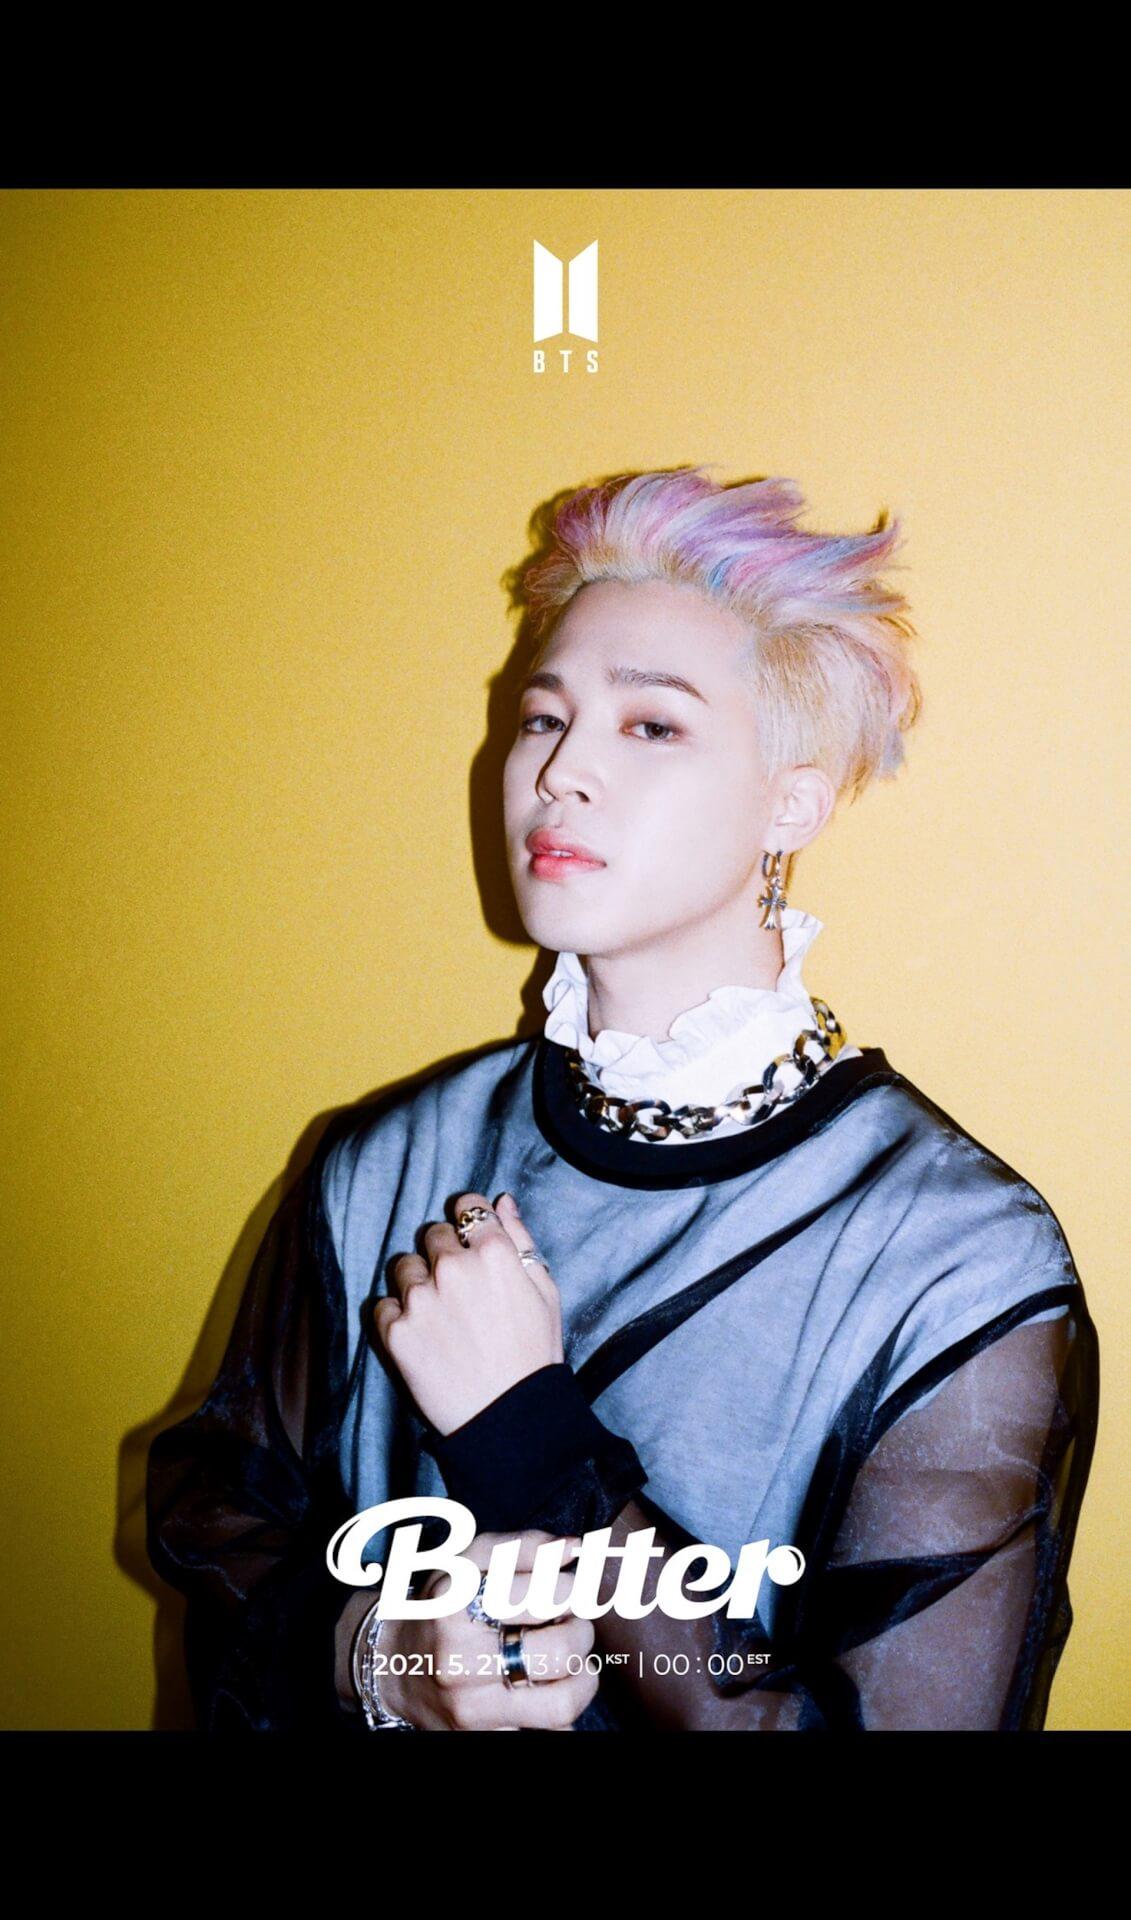 "BTSニューシングル""Butter""の第2弾ティーザーフォトが一挙解禁!メンバー勢ぞろい&ソロカットも music210517_bts_butter_3"